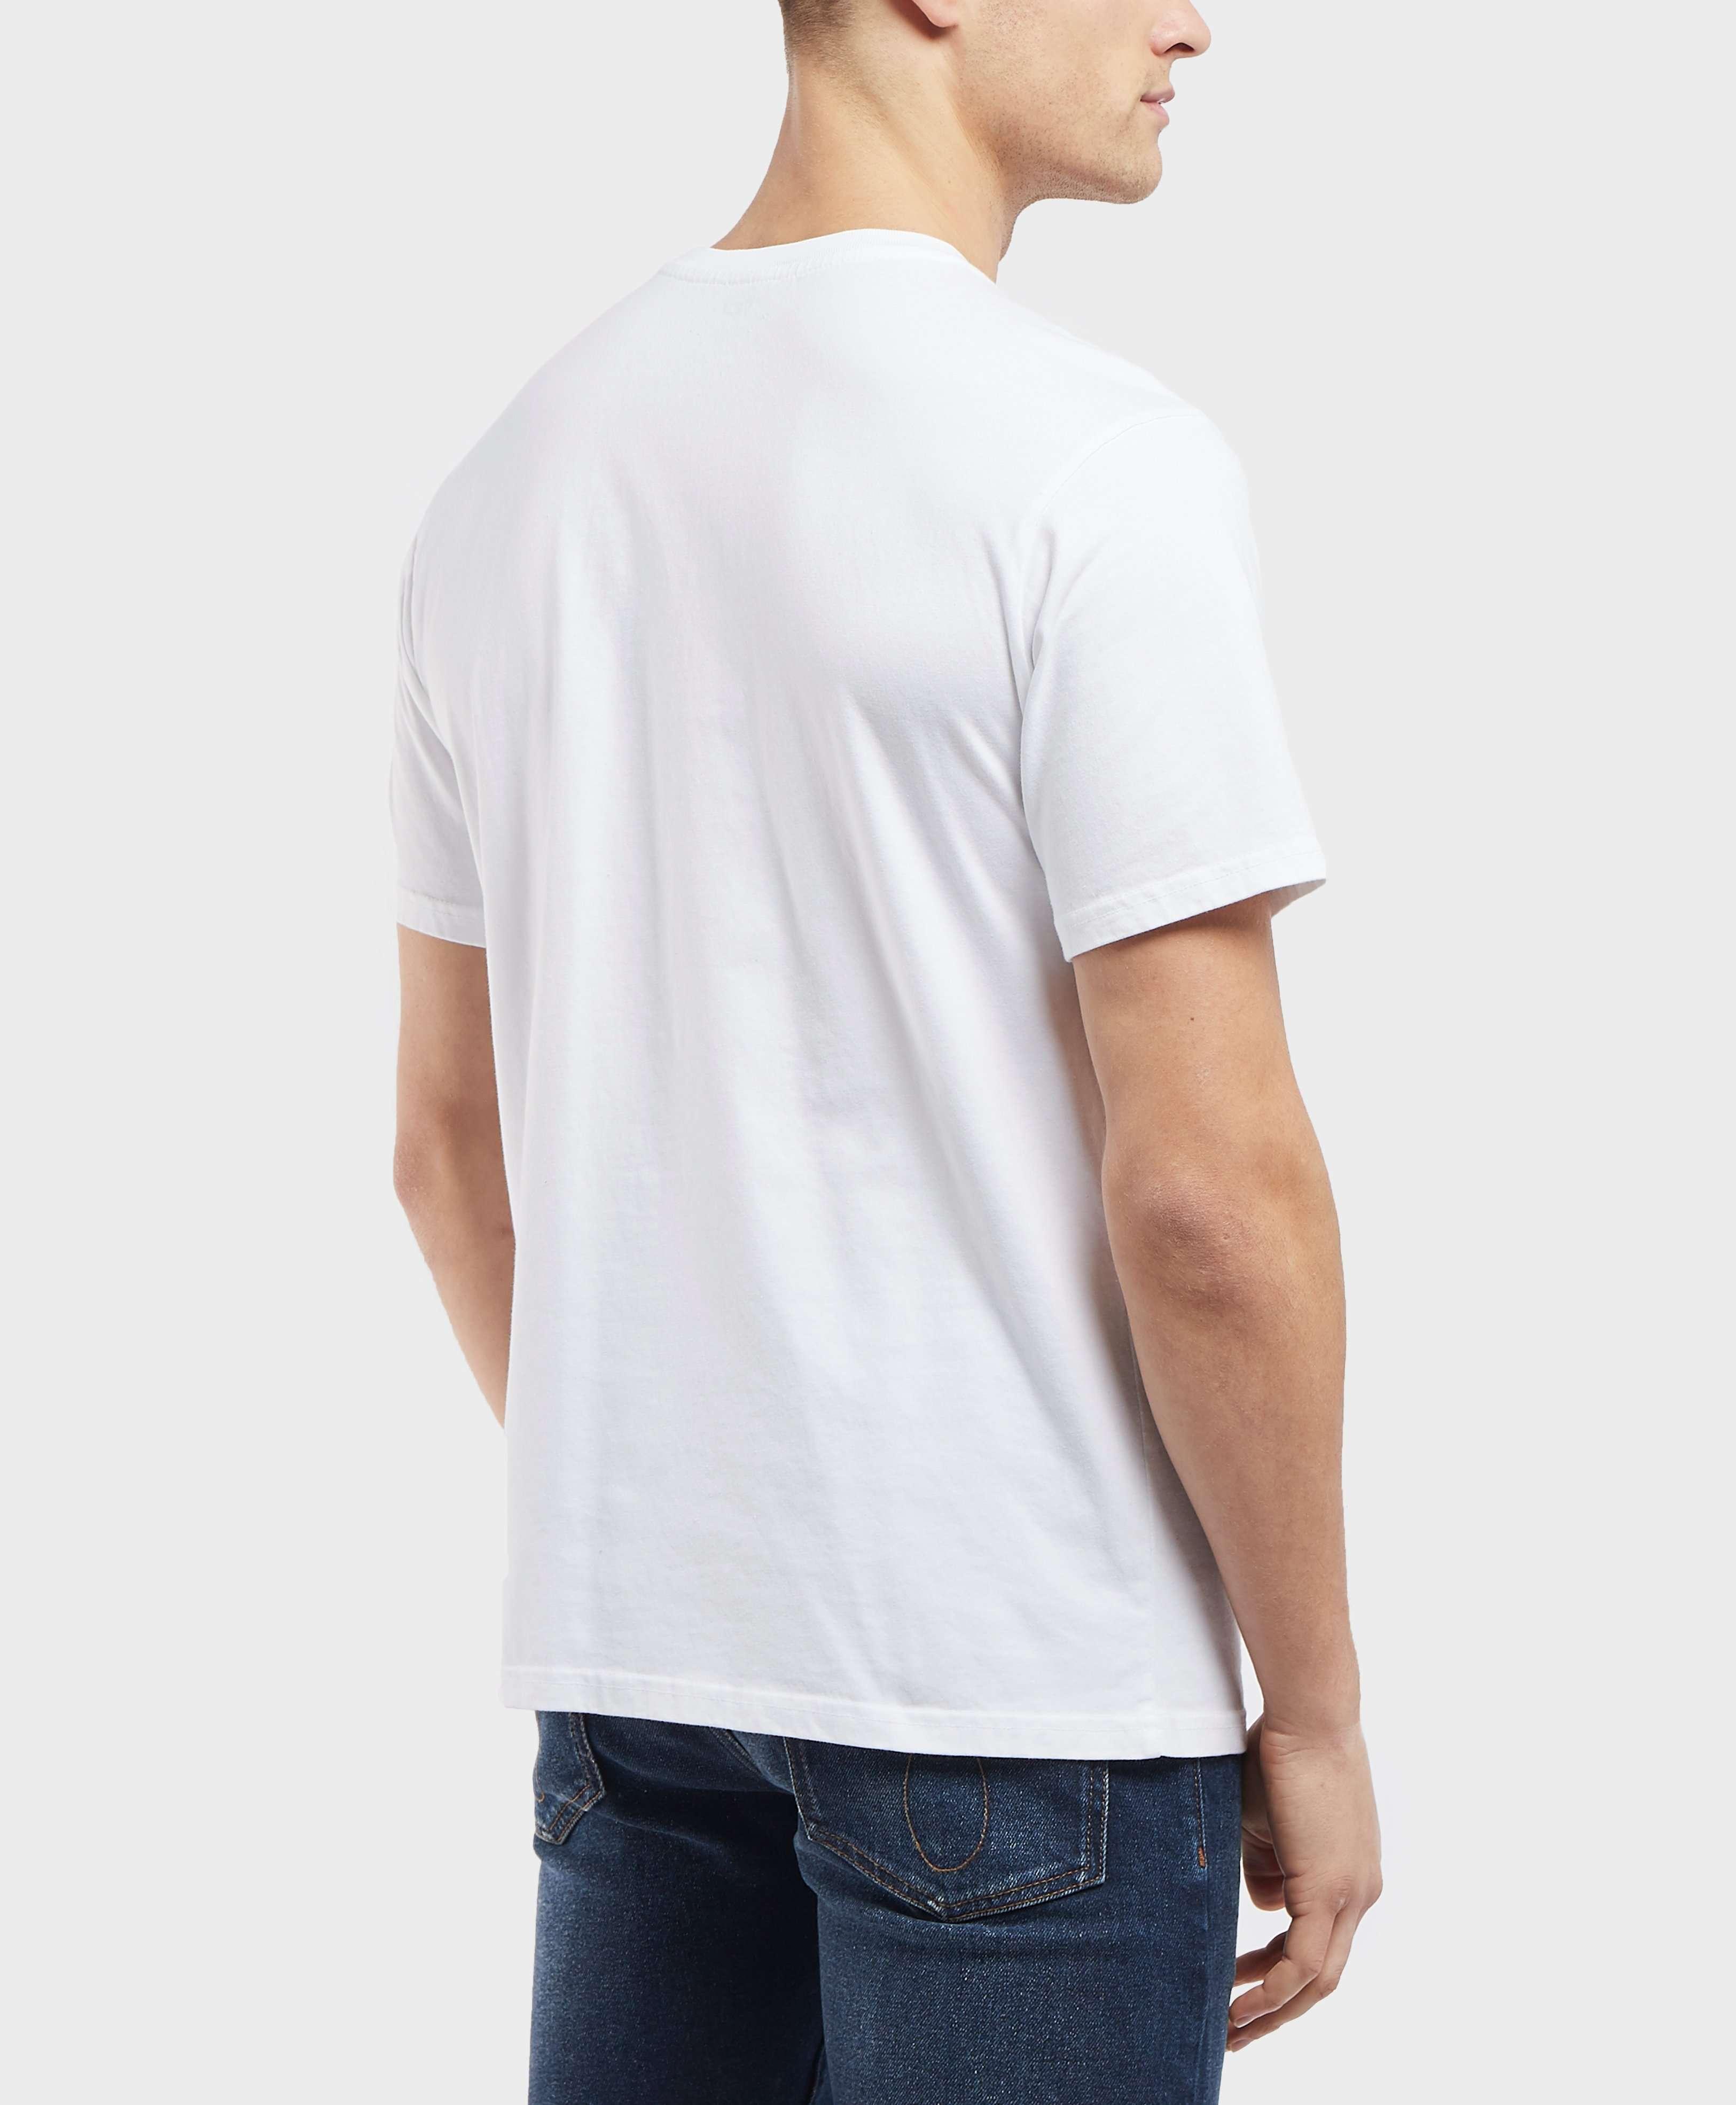 Levis Central Logo Short Sleeve T-Shirt